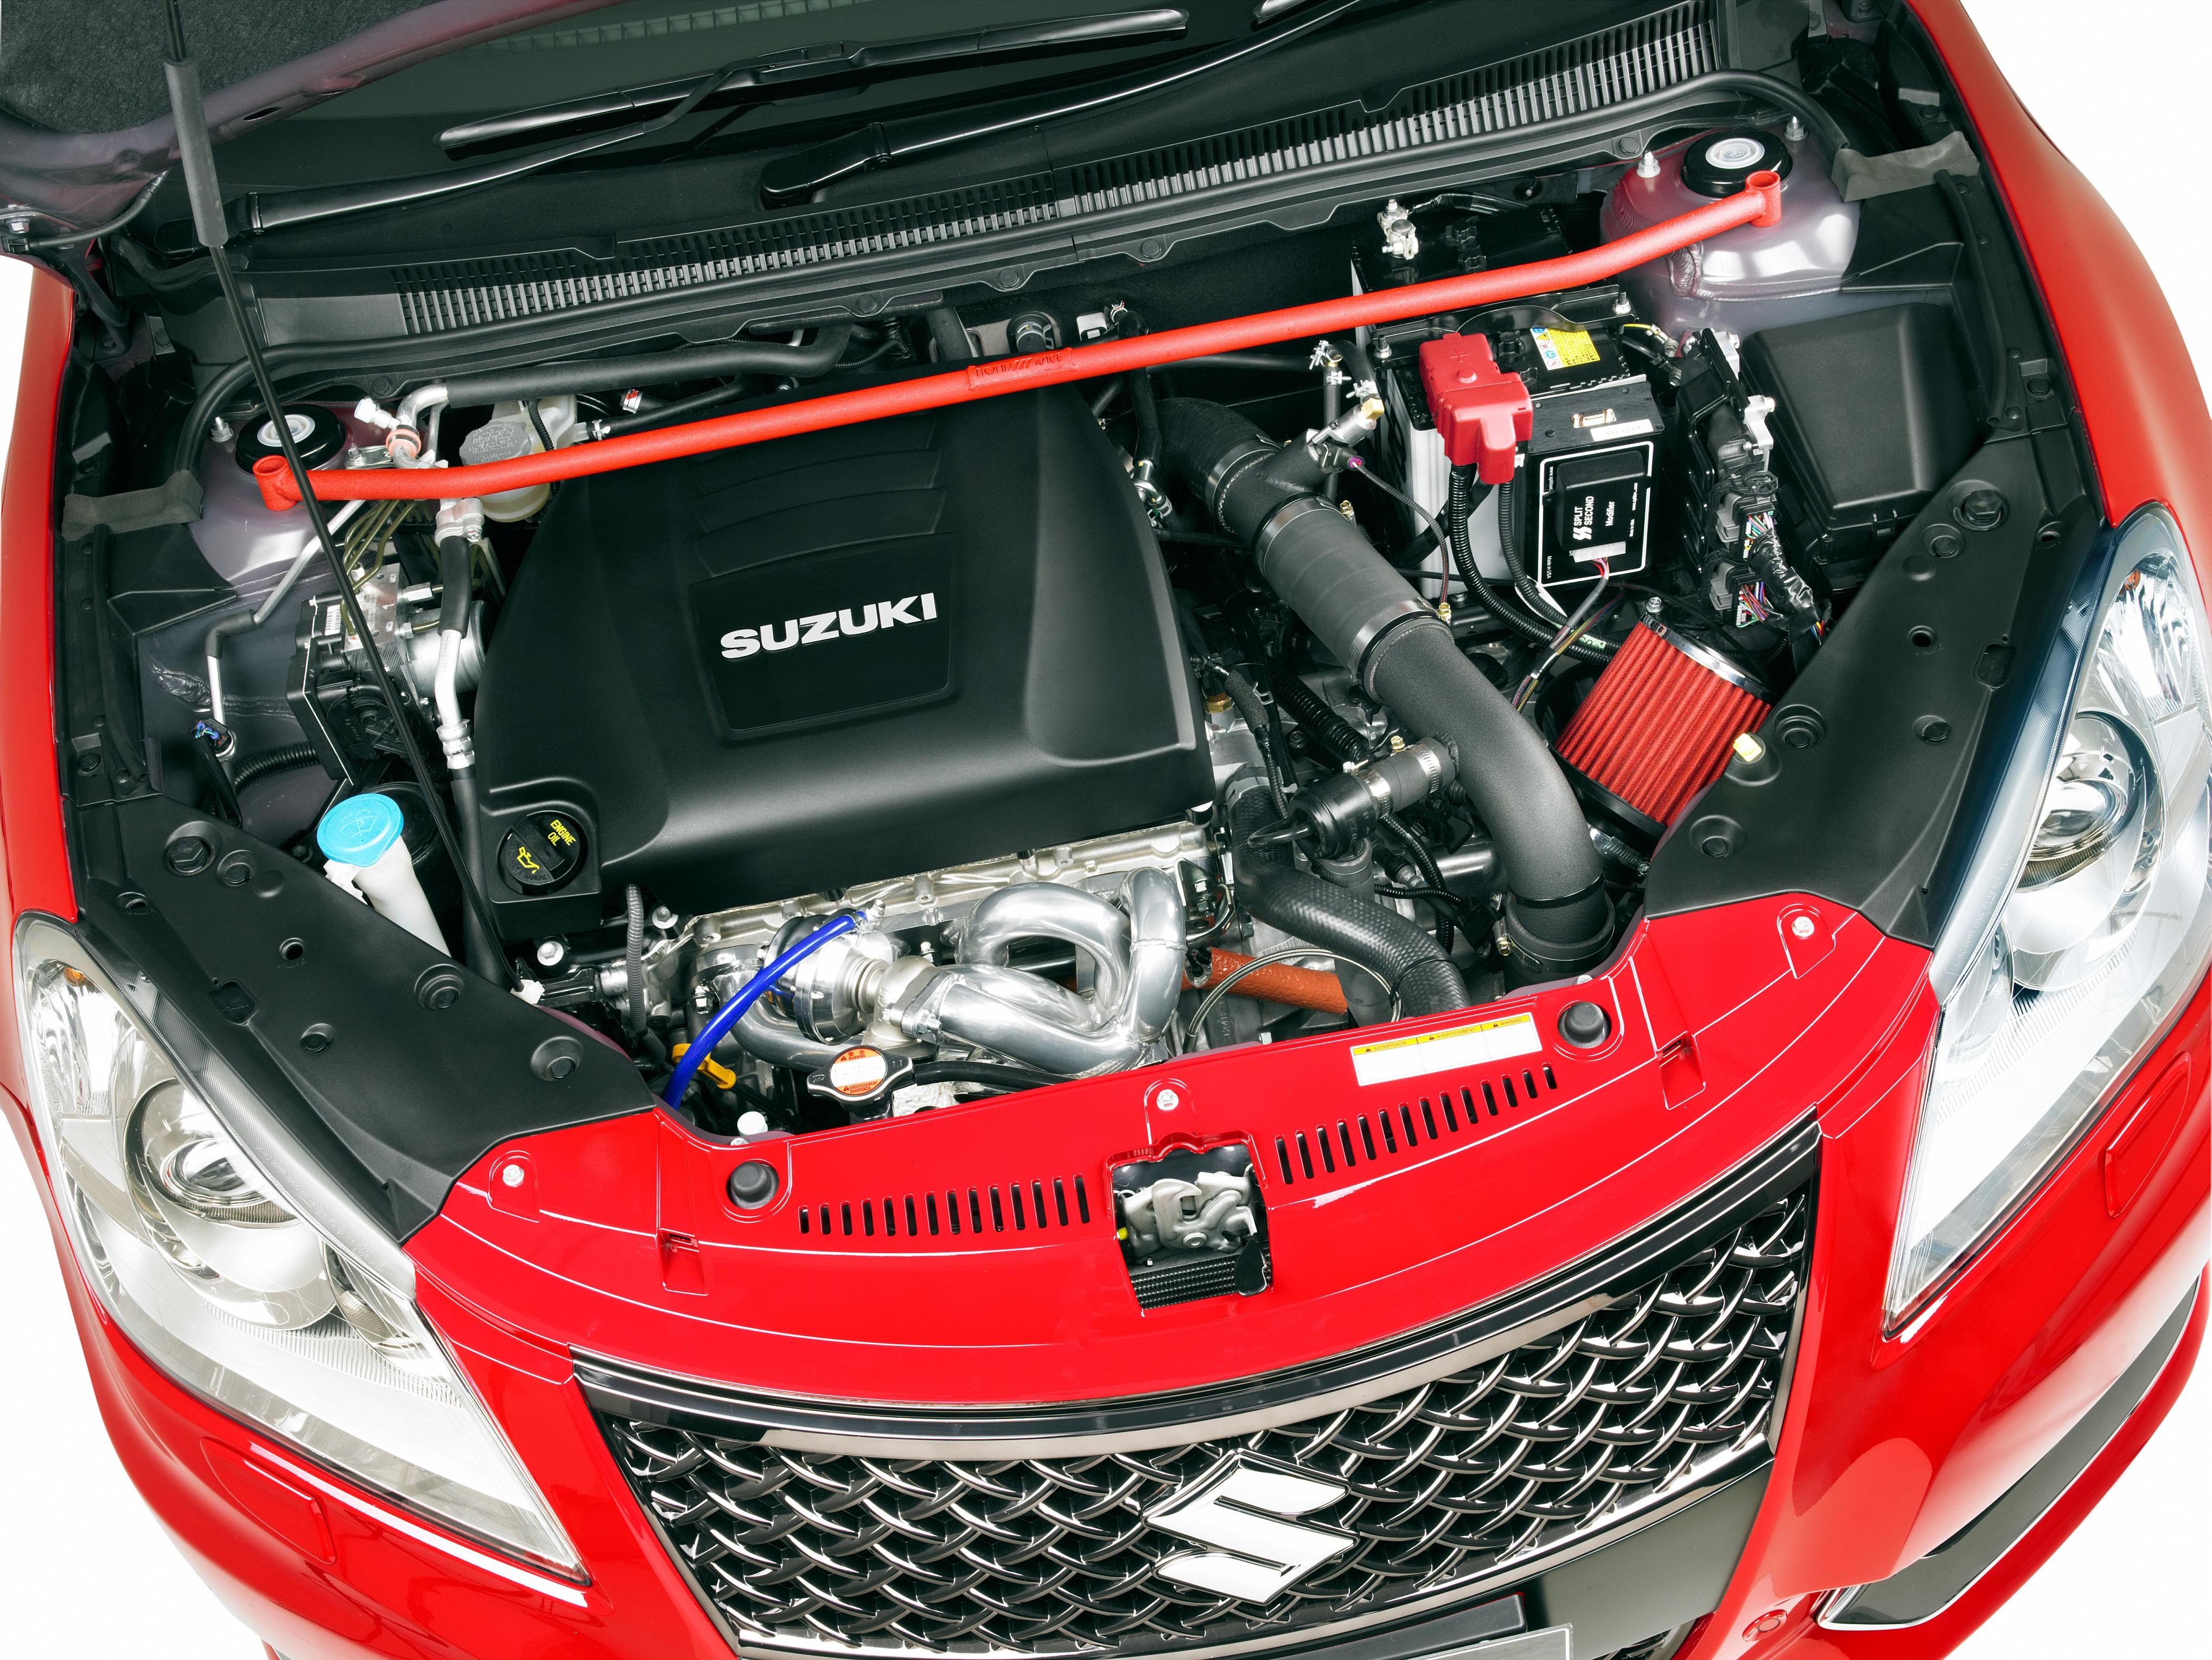 Suzuki Kizashi Air Filter And Intake